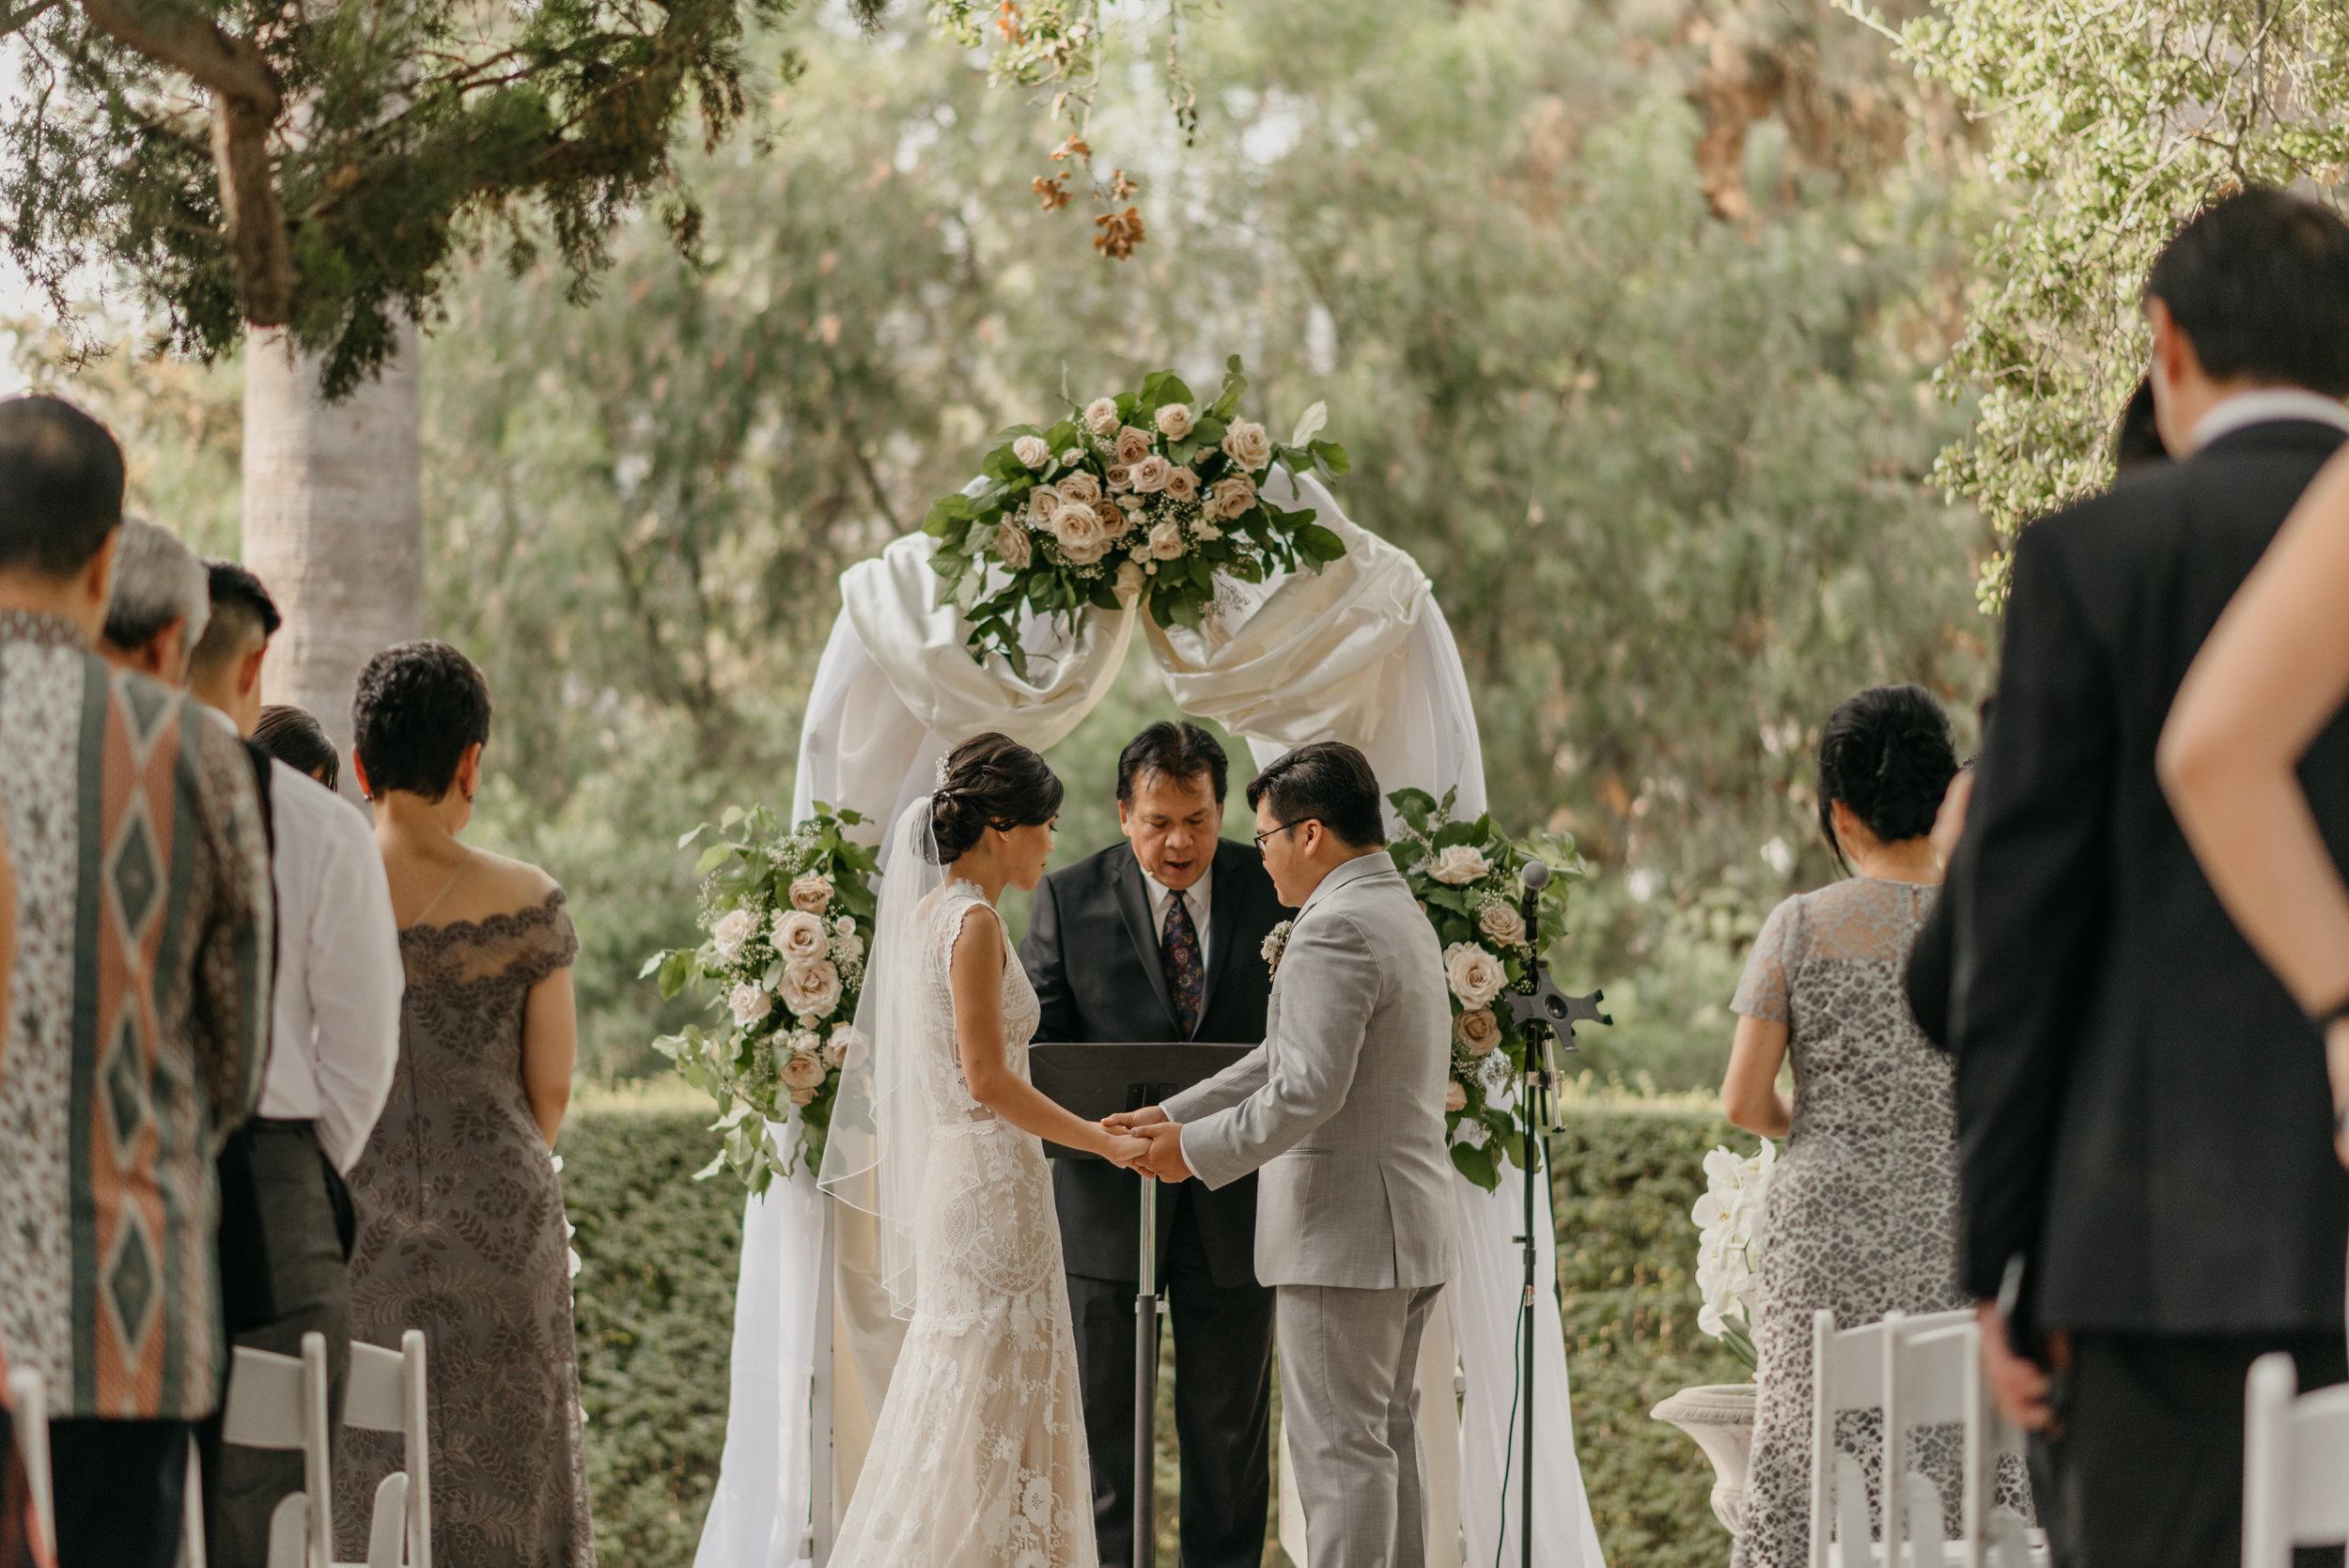 348-Ceremony-5001.jpg